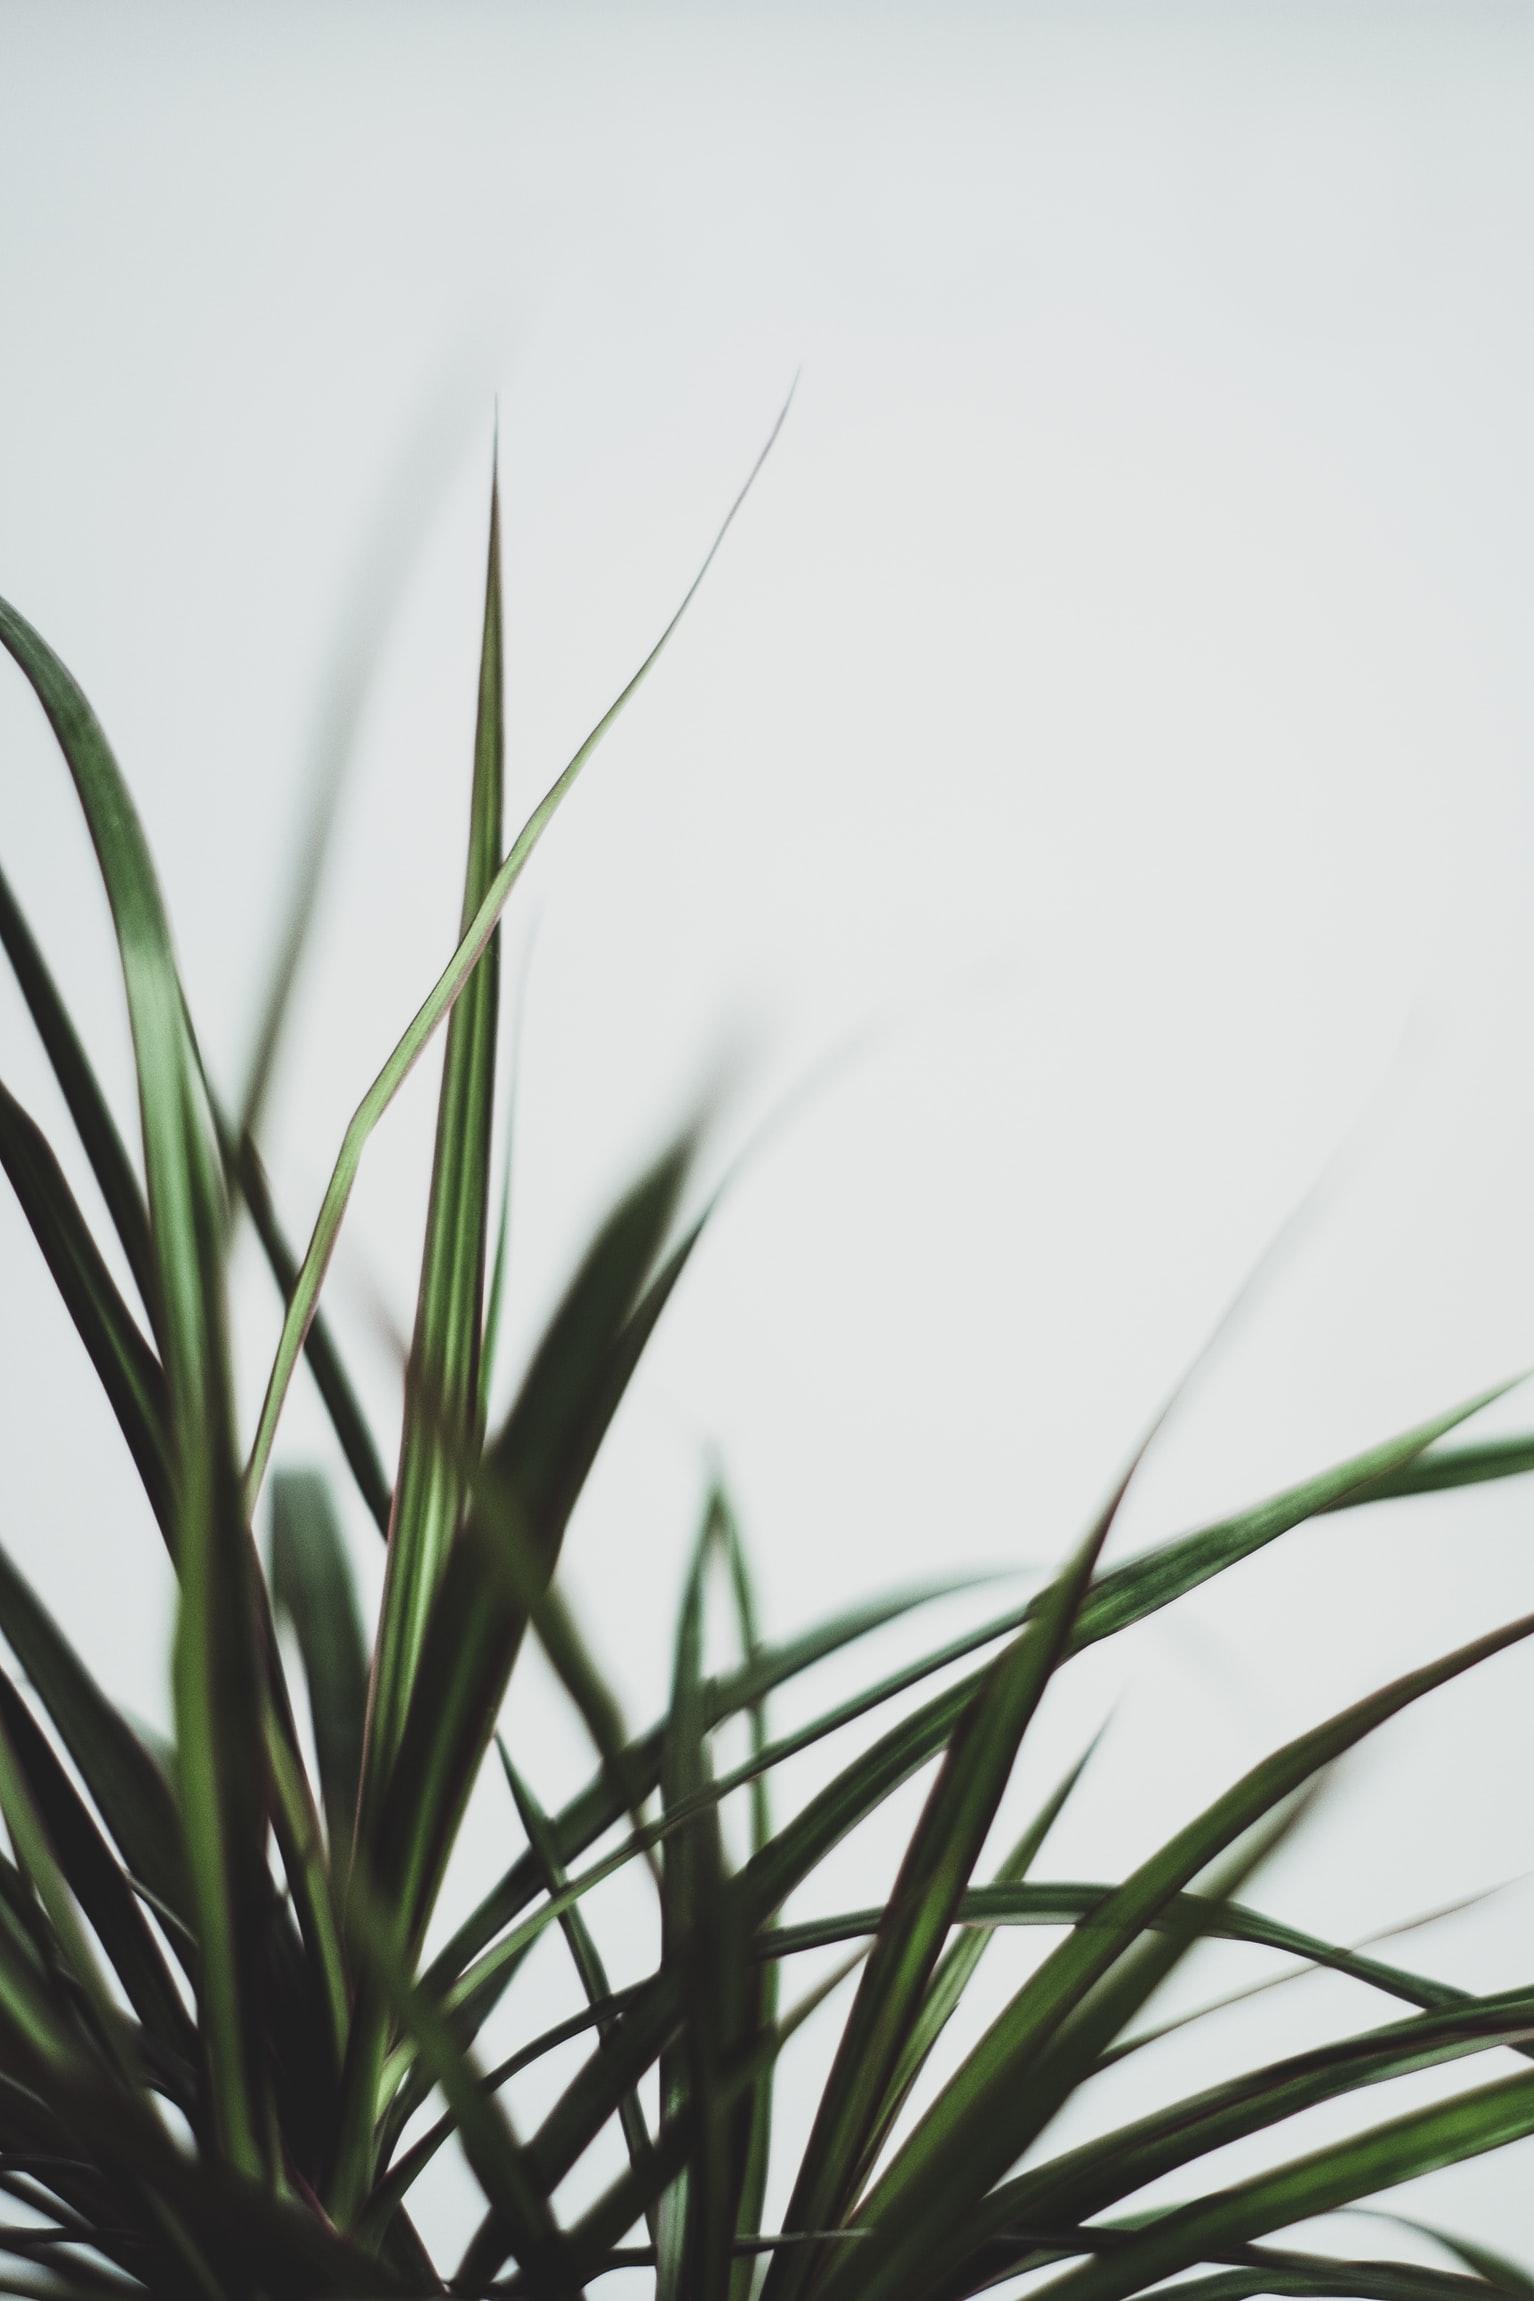 dracaena marginata leaves in white background